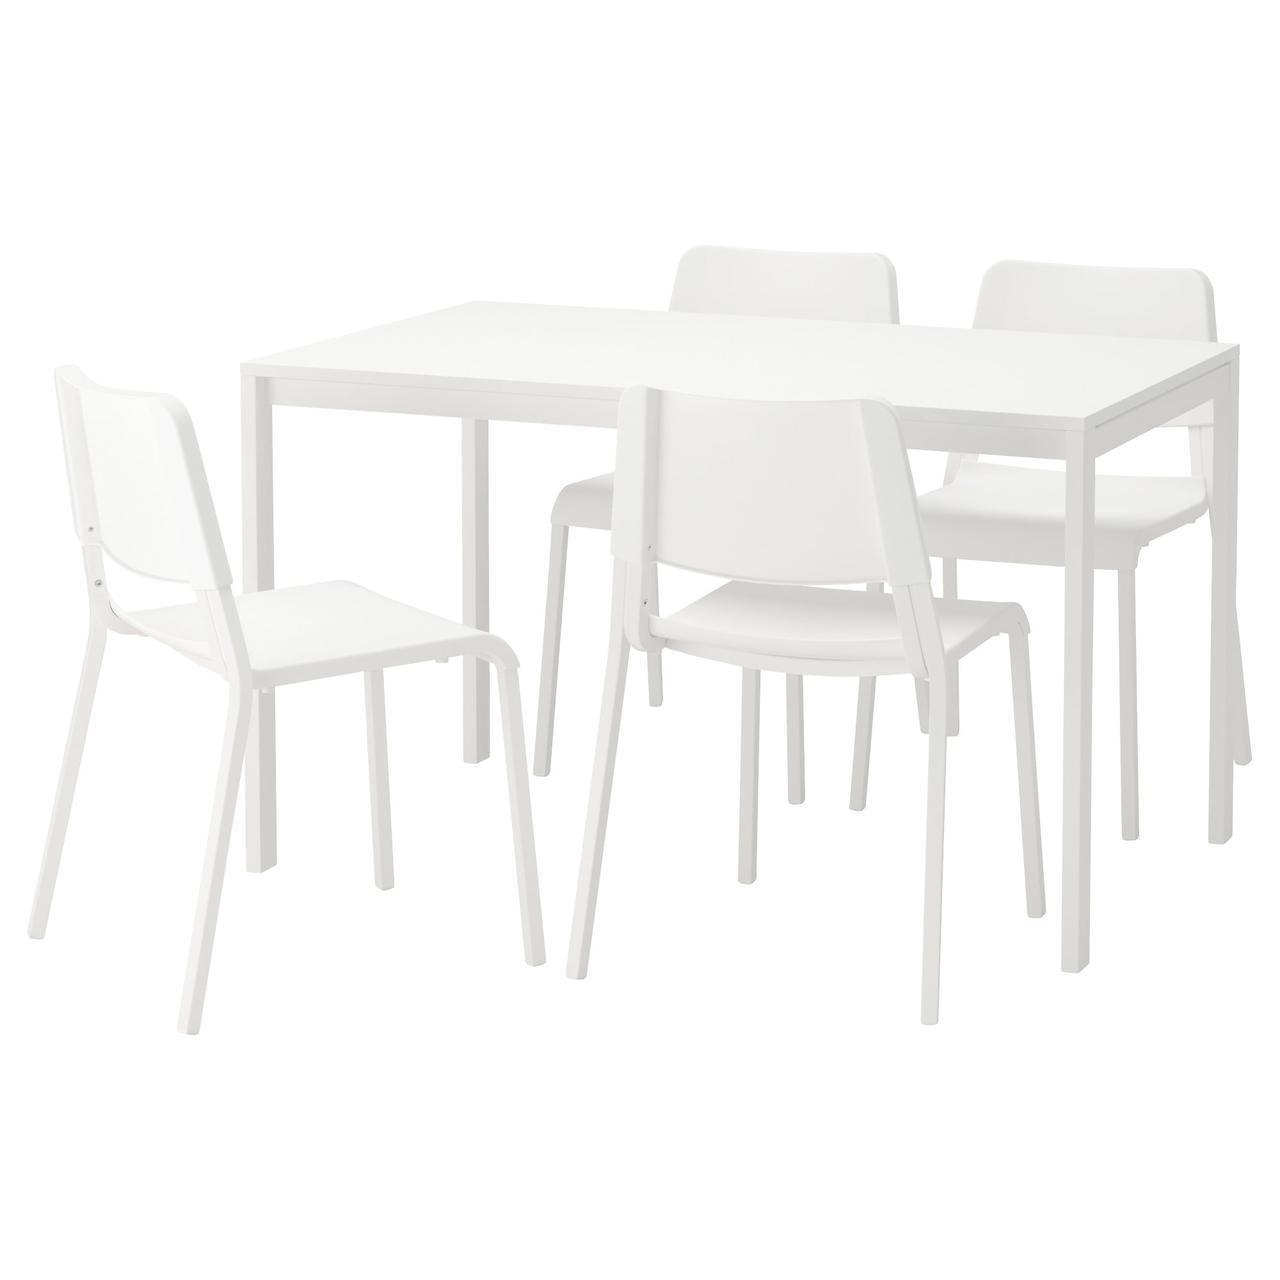 IKEA MELLTORP / TEODORES (292.212.56) Стол и 4 стула